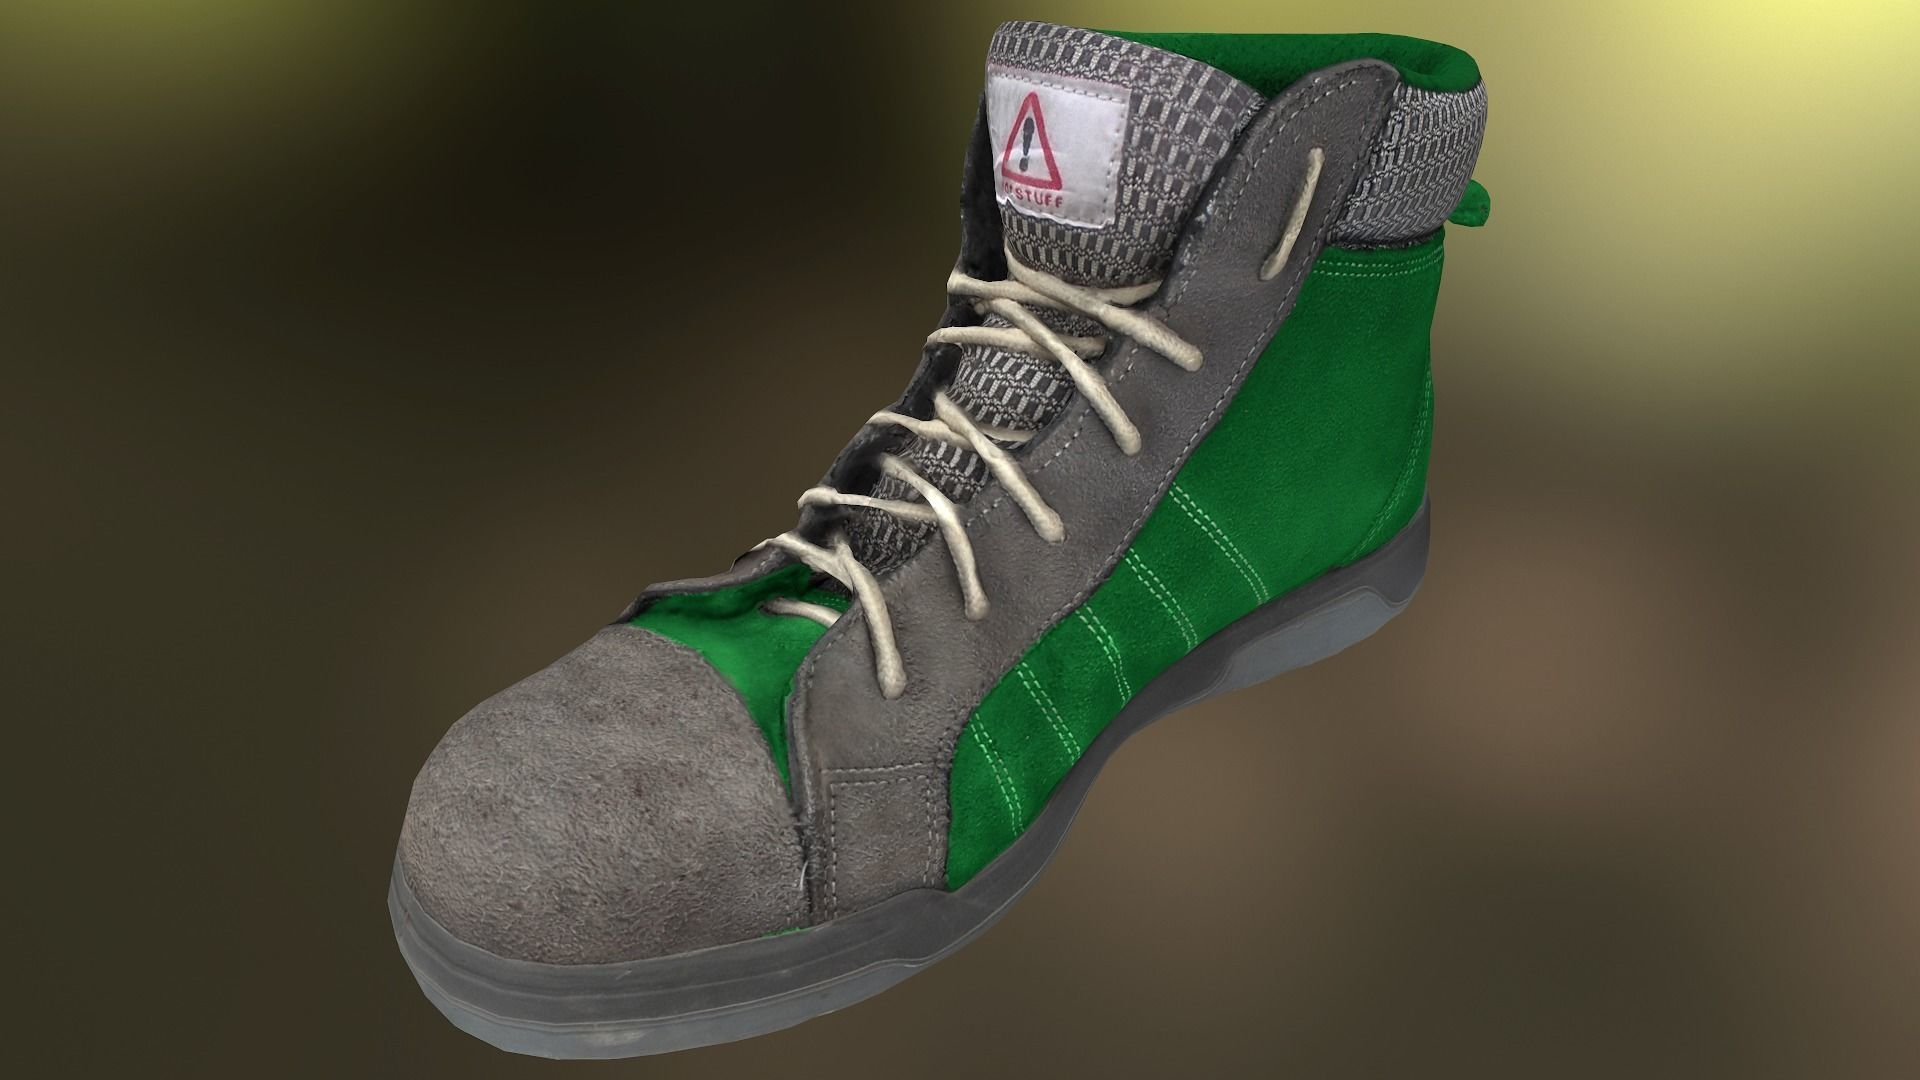 Boot 3D model lowpoly